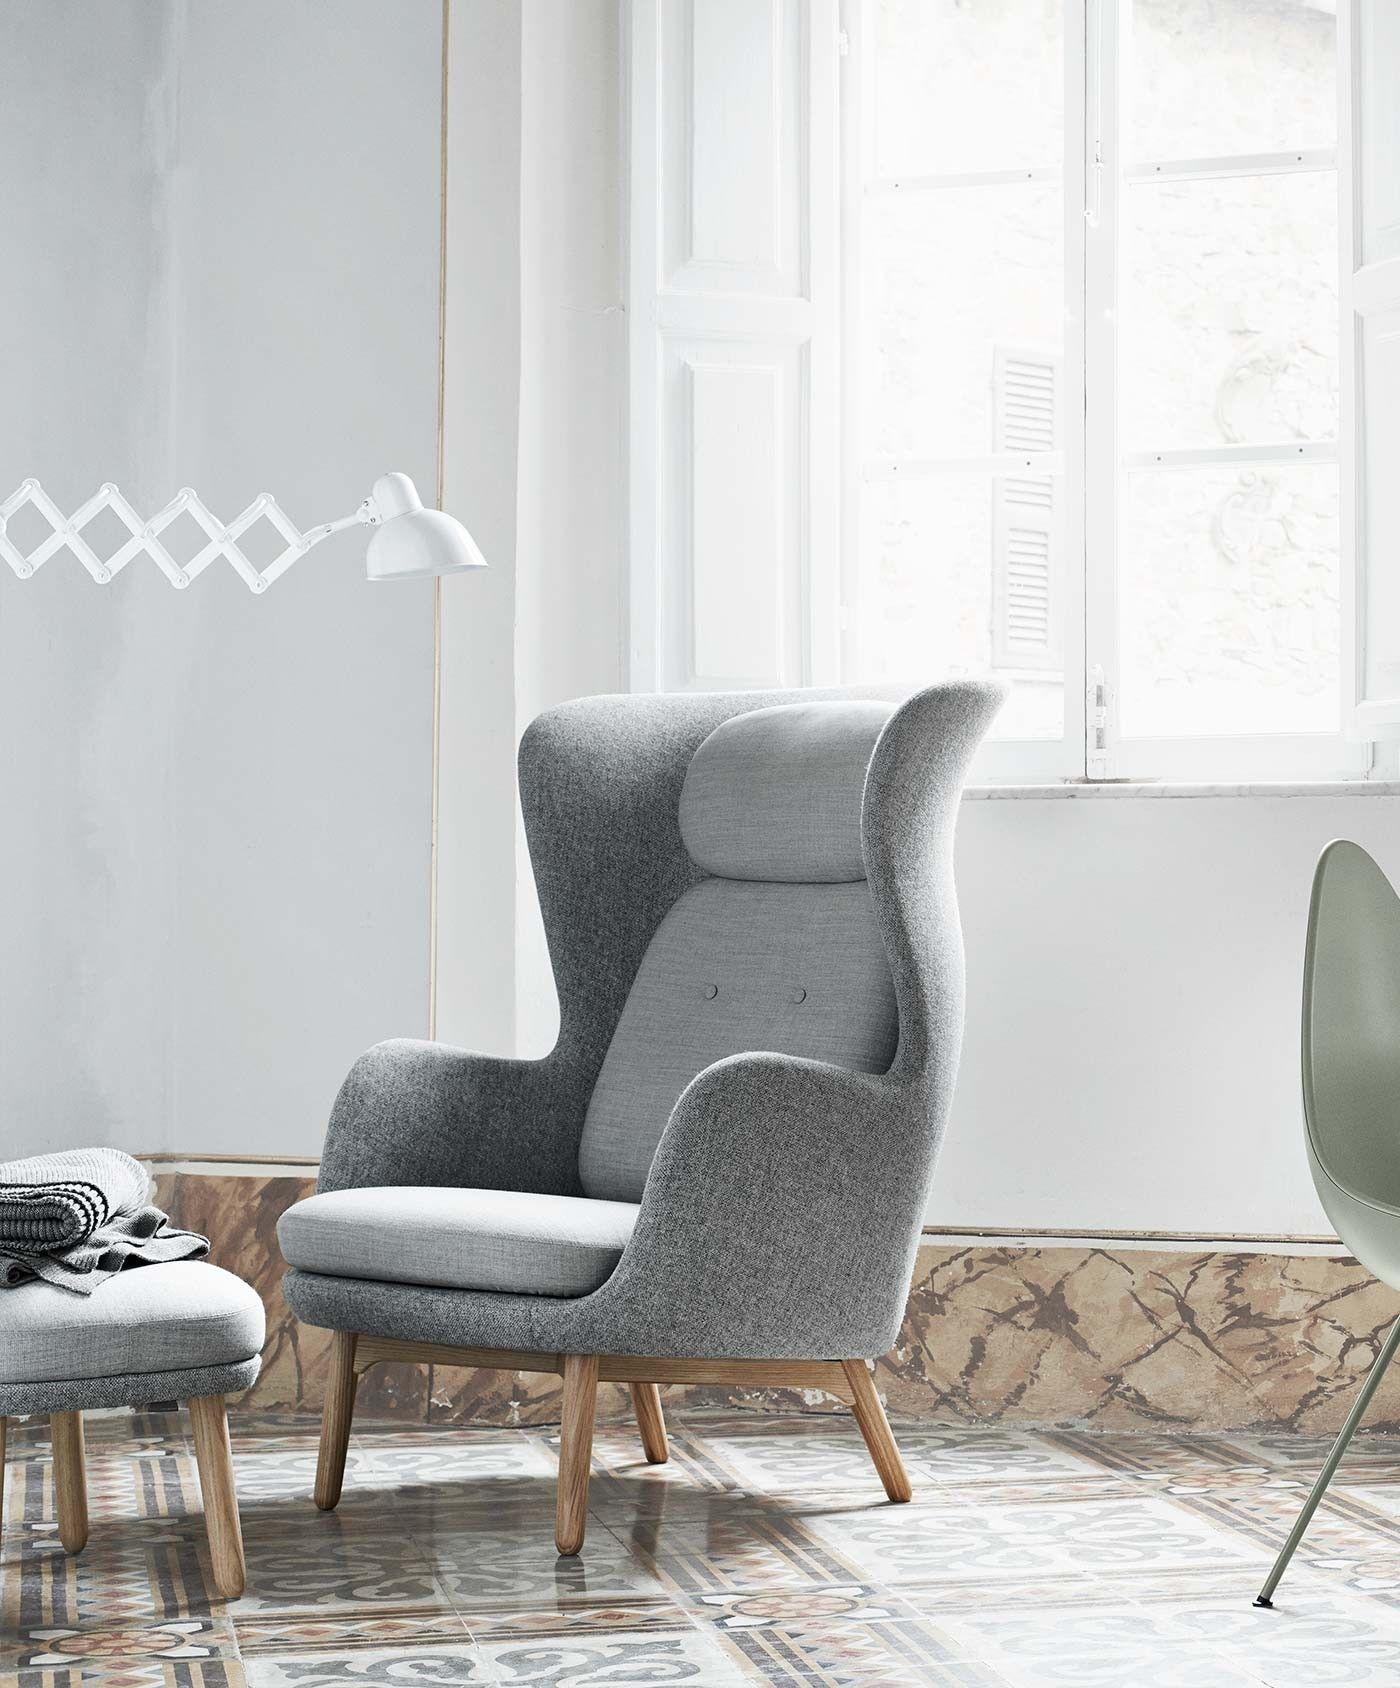 fritz hansen ro lounge stoel sterkonline i pinterest. Black Bedroom Furniture Sets. Home Design Ideas